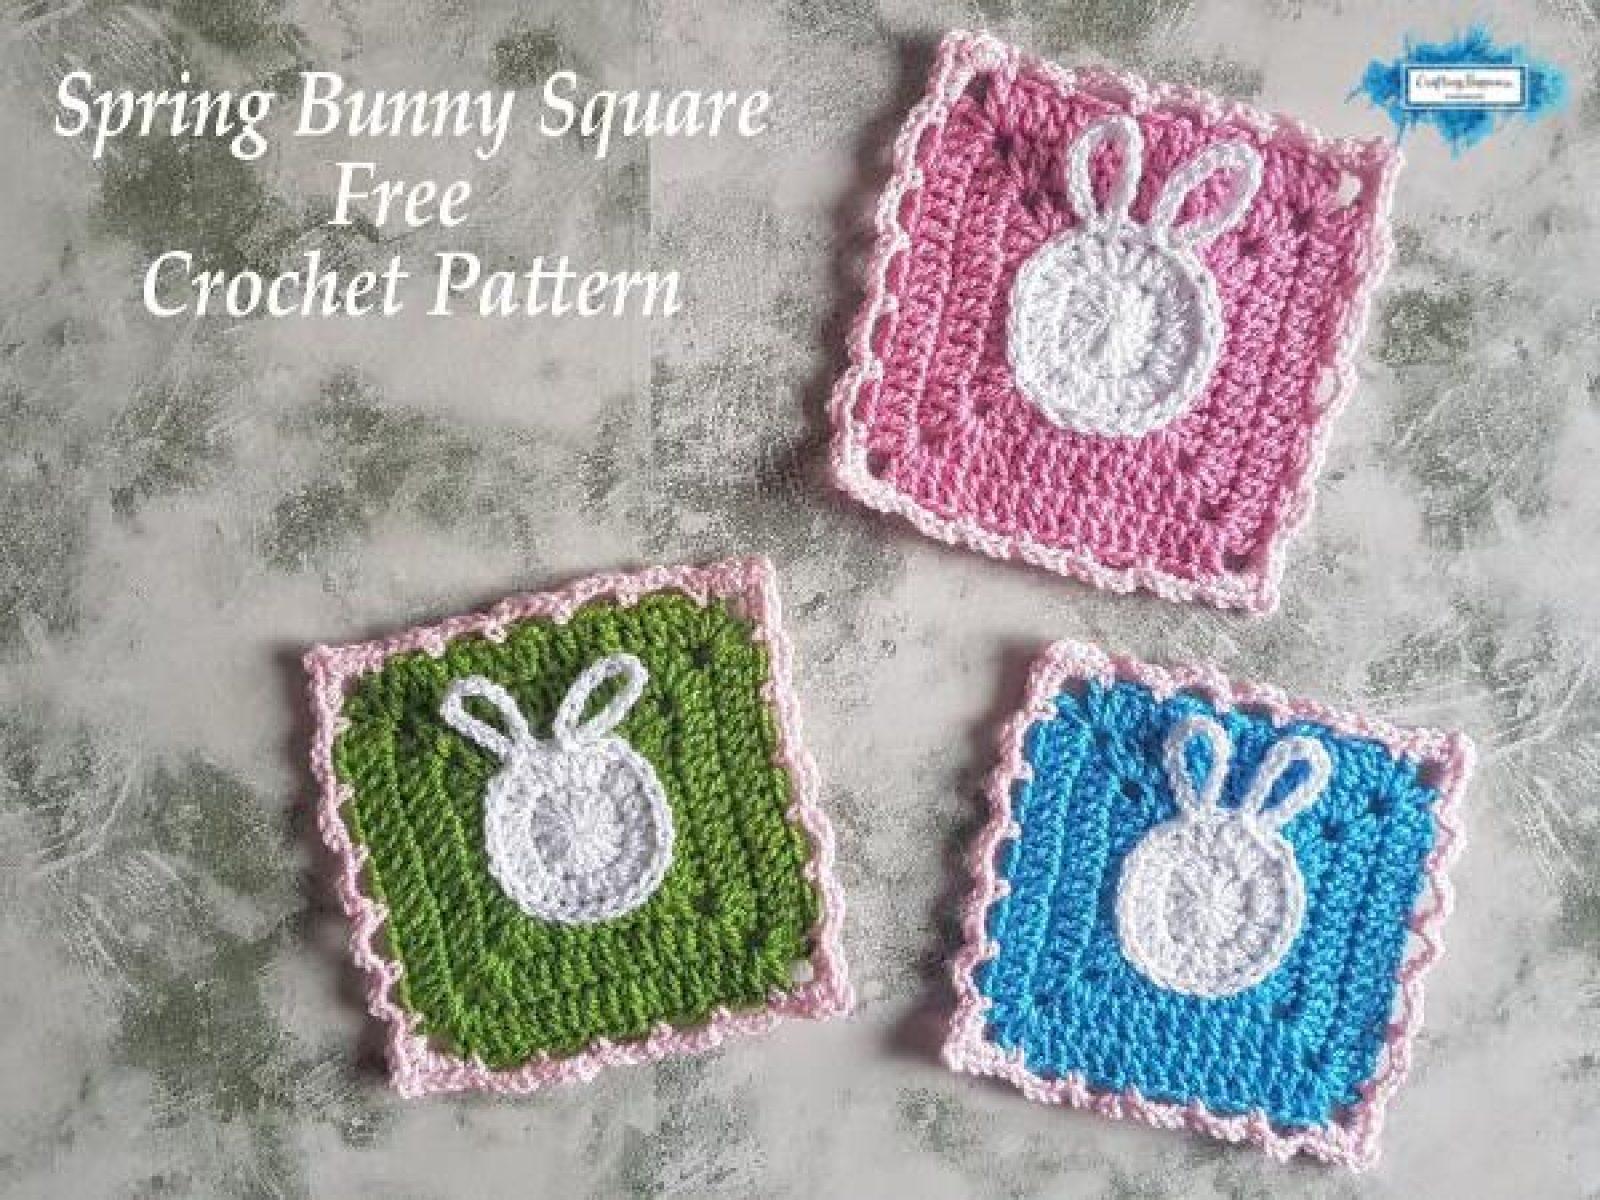 Free Crochet Bunny Granny Square Pattern